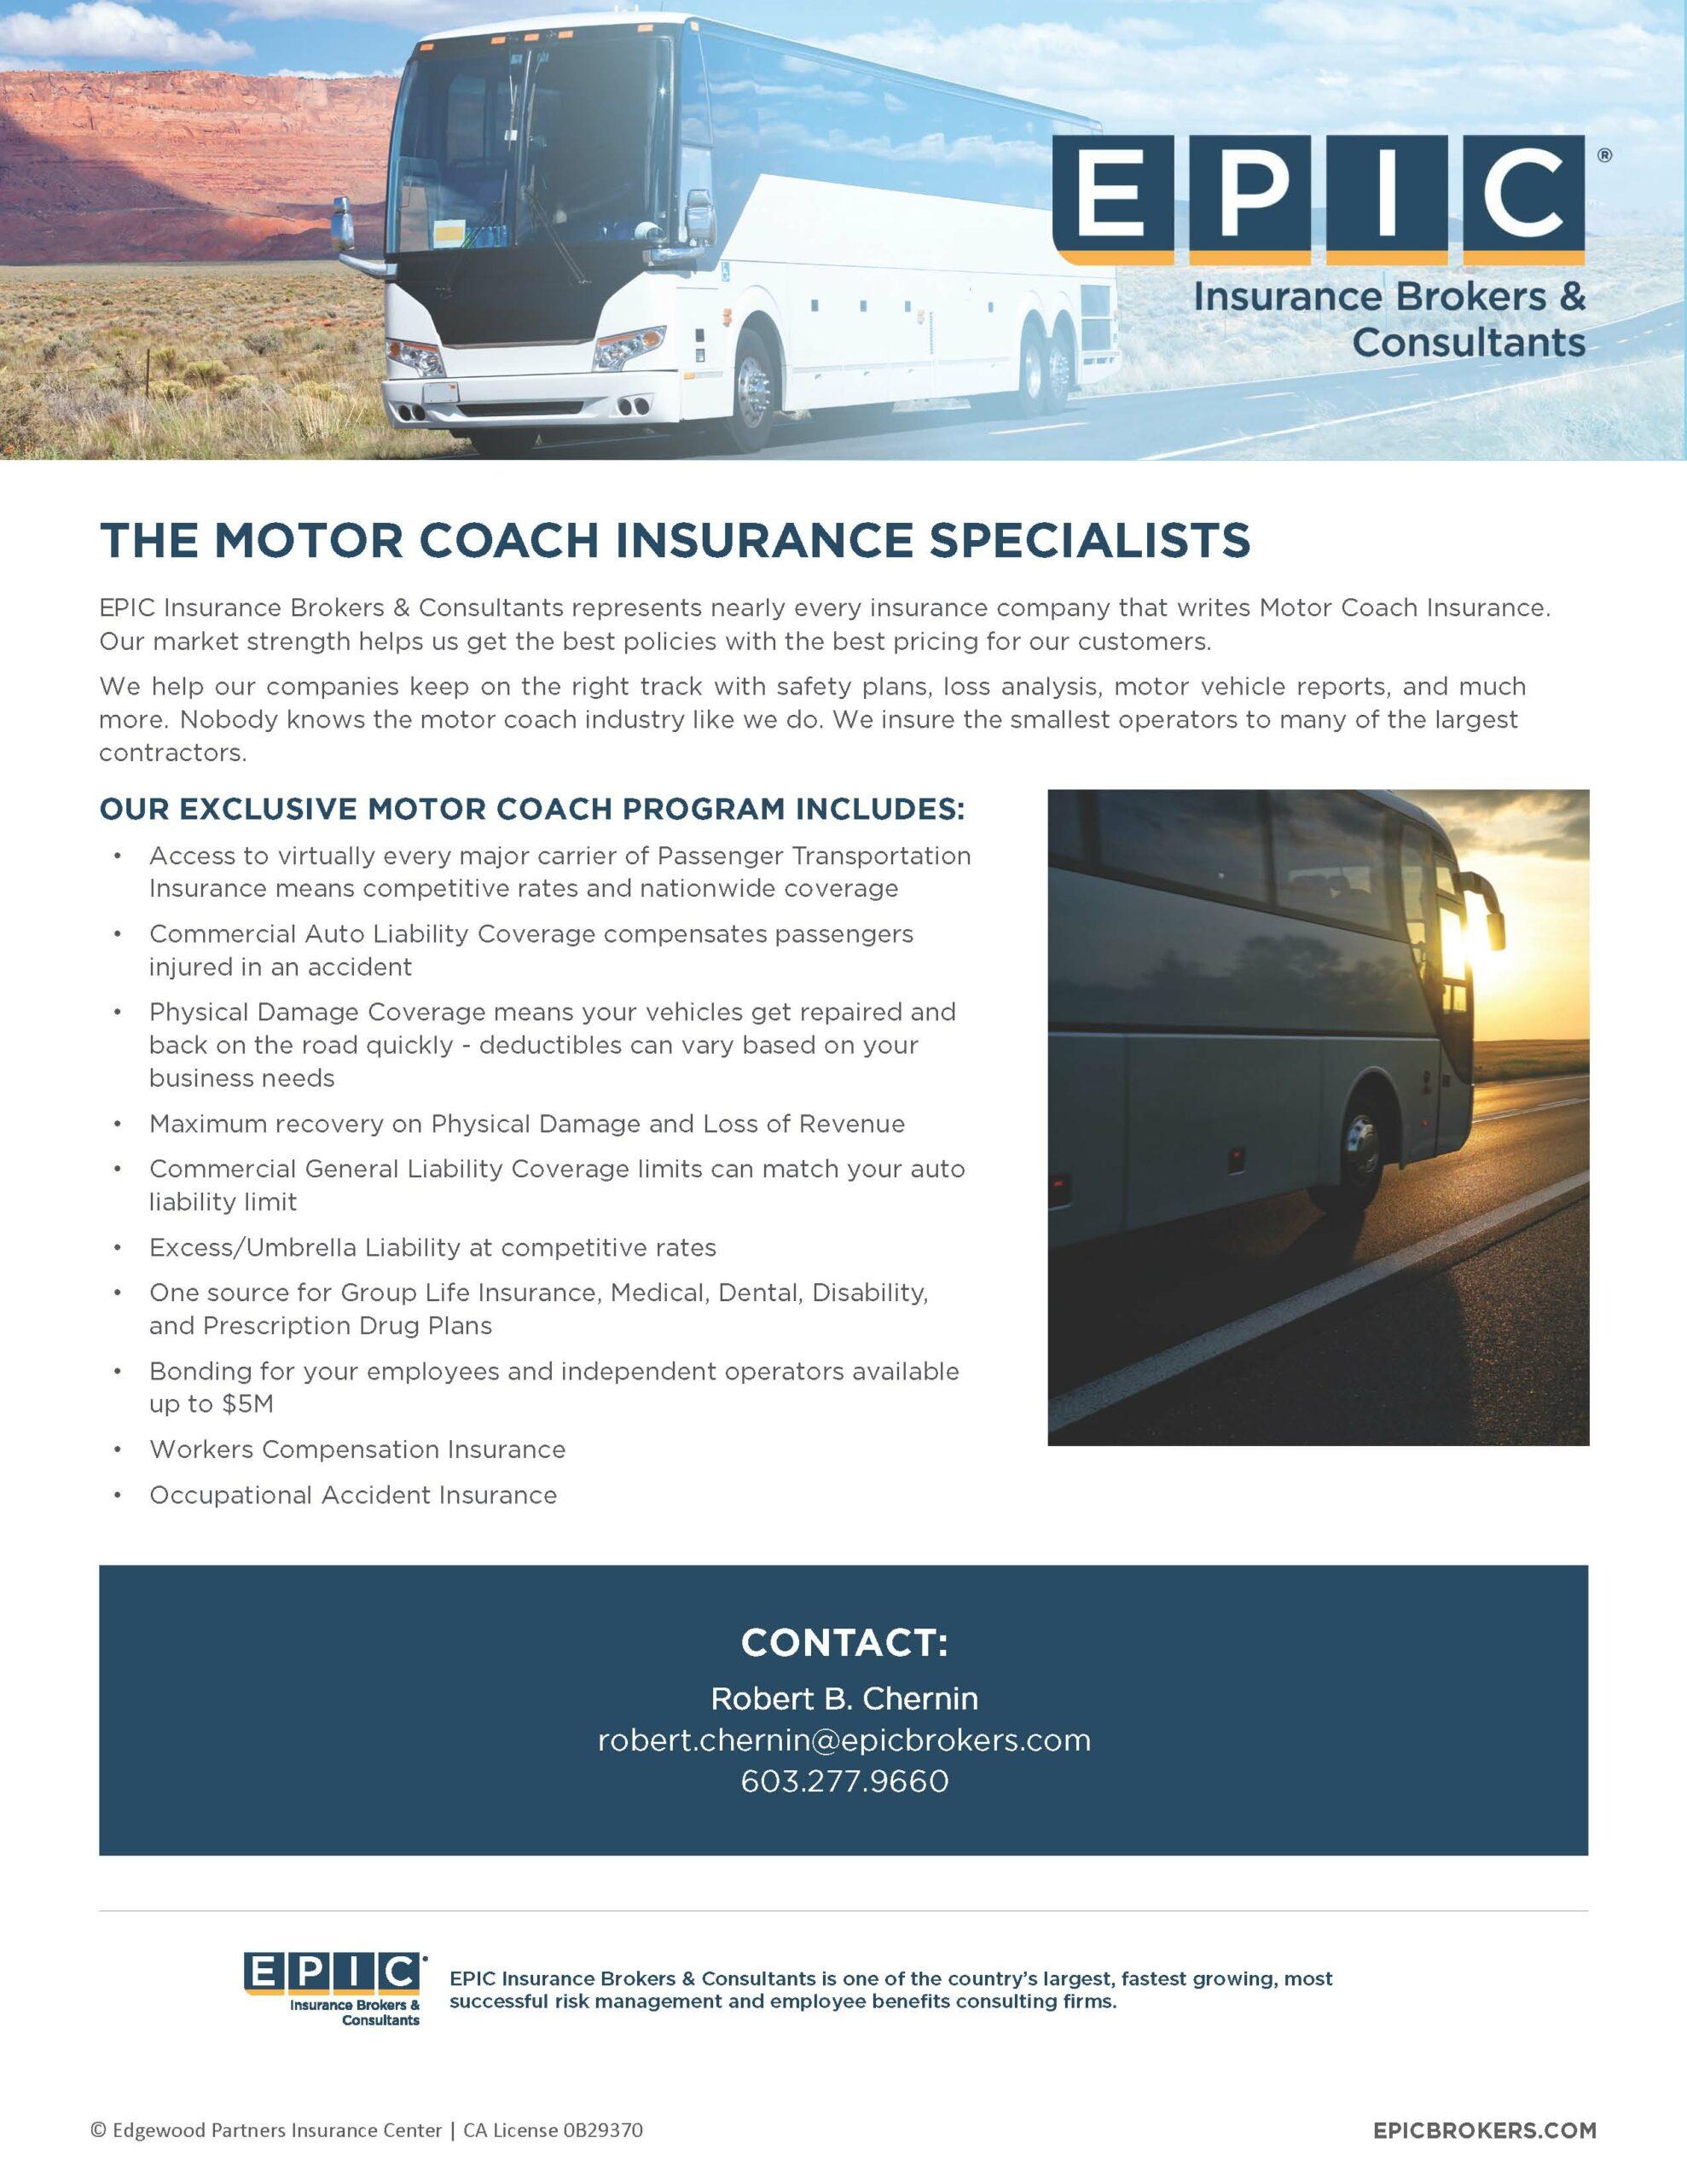 Motor Coach Insurance